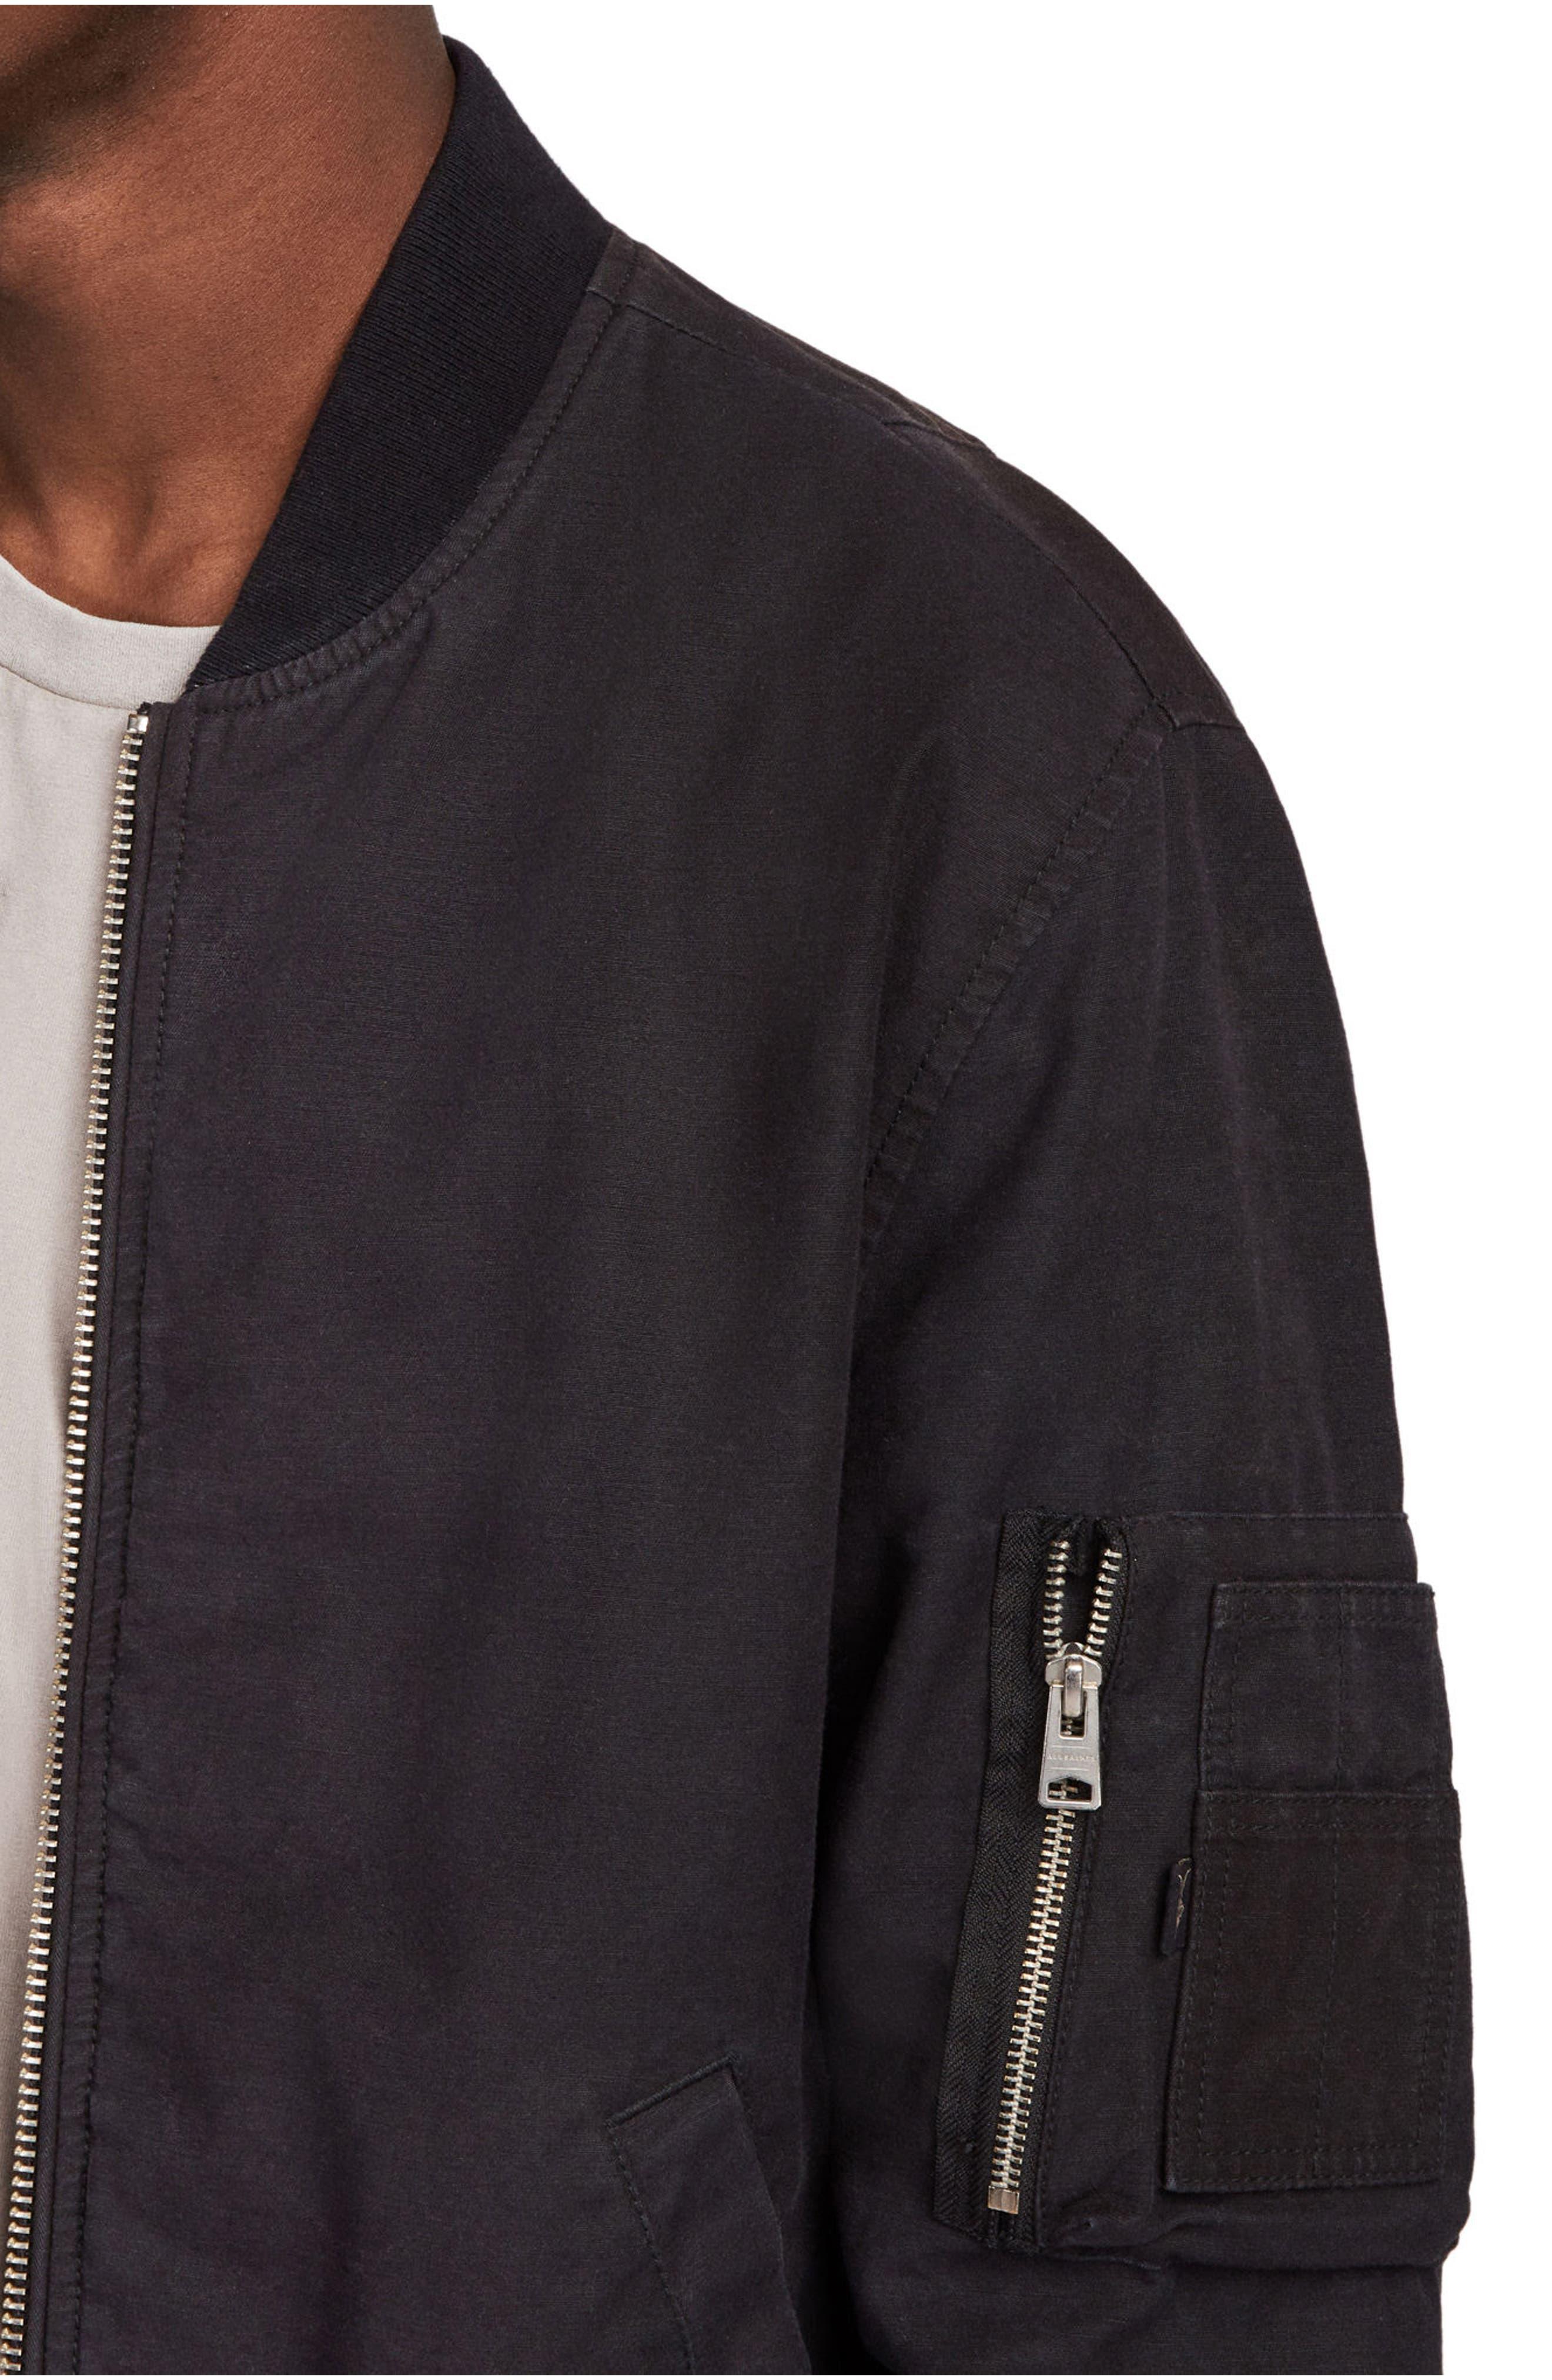 Moyne Bomber Jacket,                             Alternate thumbnail 4, color,                             Black